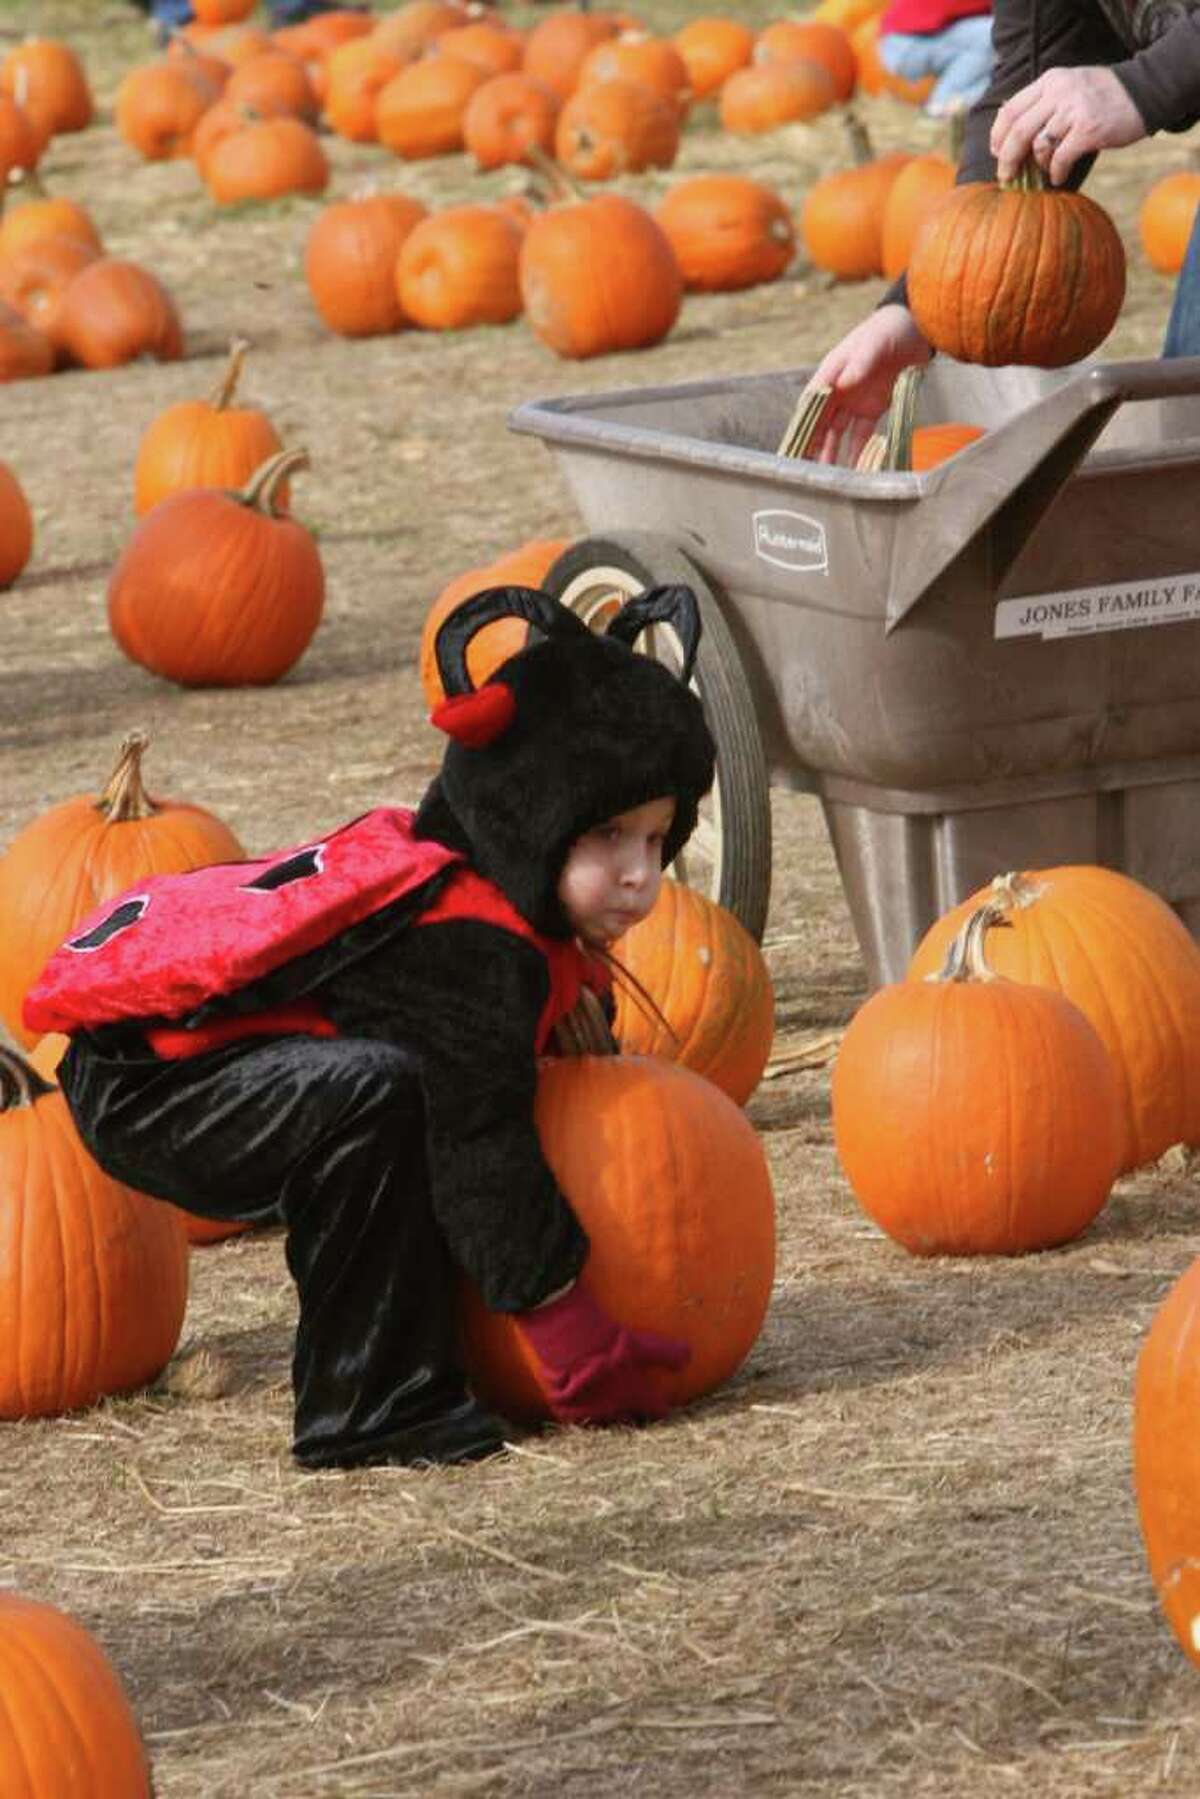 Jones Tree Farm holds a UNICEF Family Festival on Sunday, October 24, 2010.